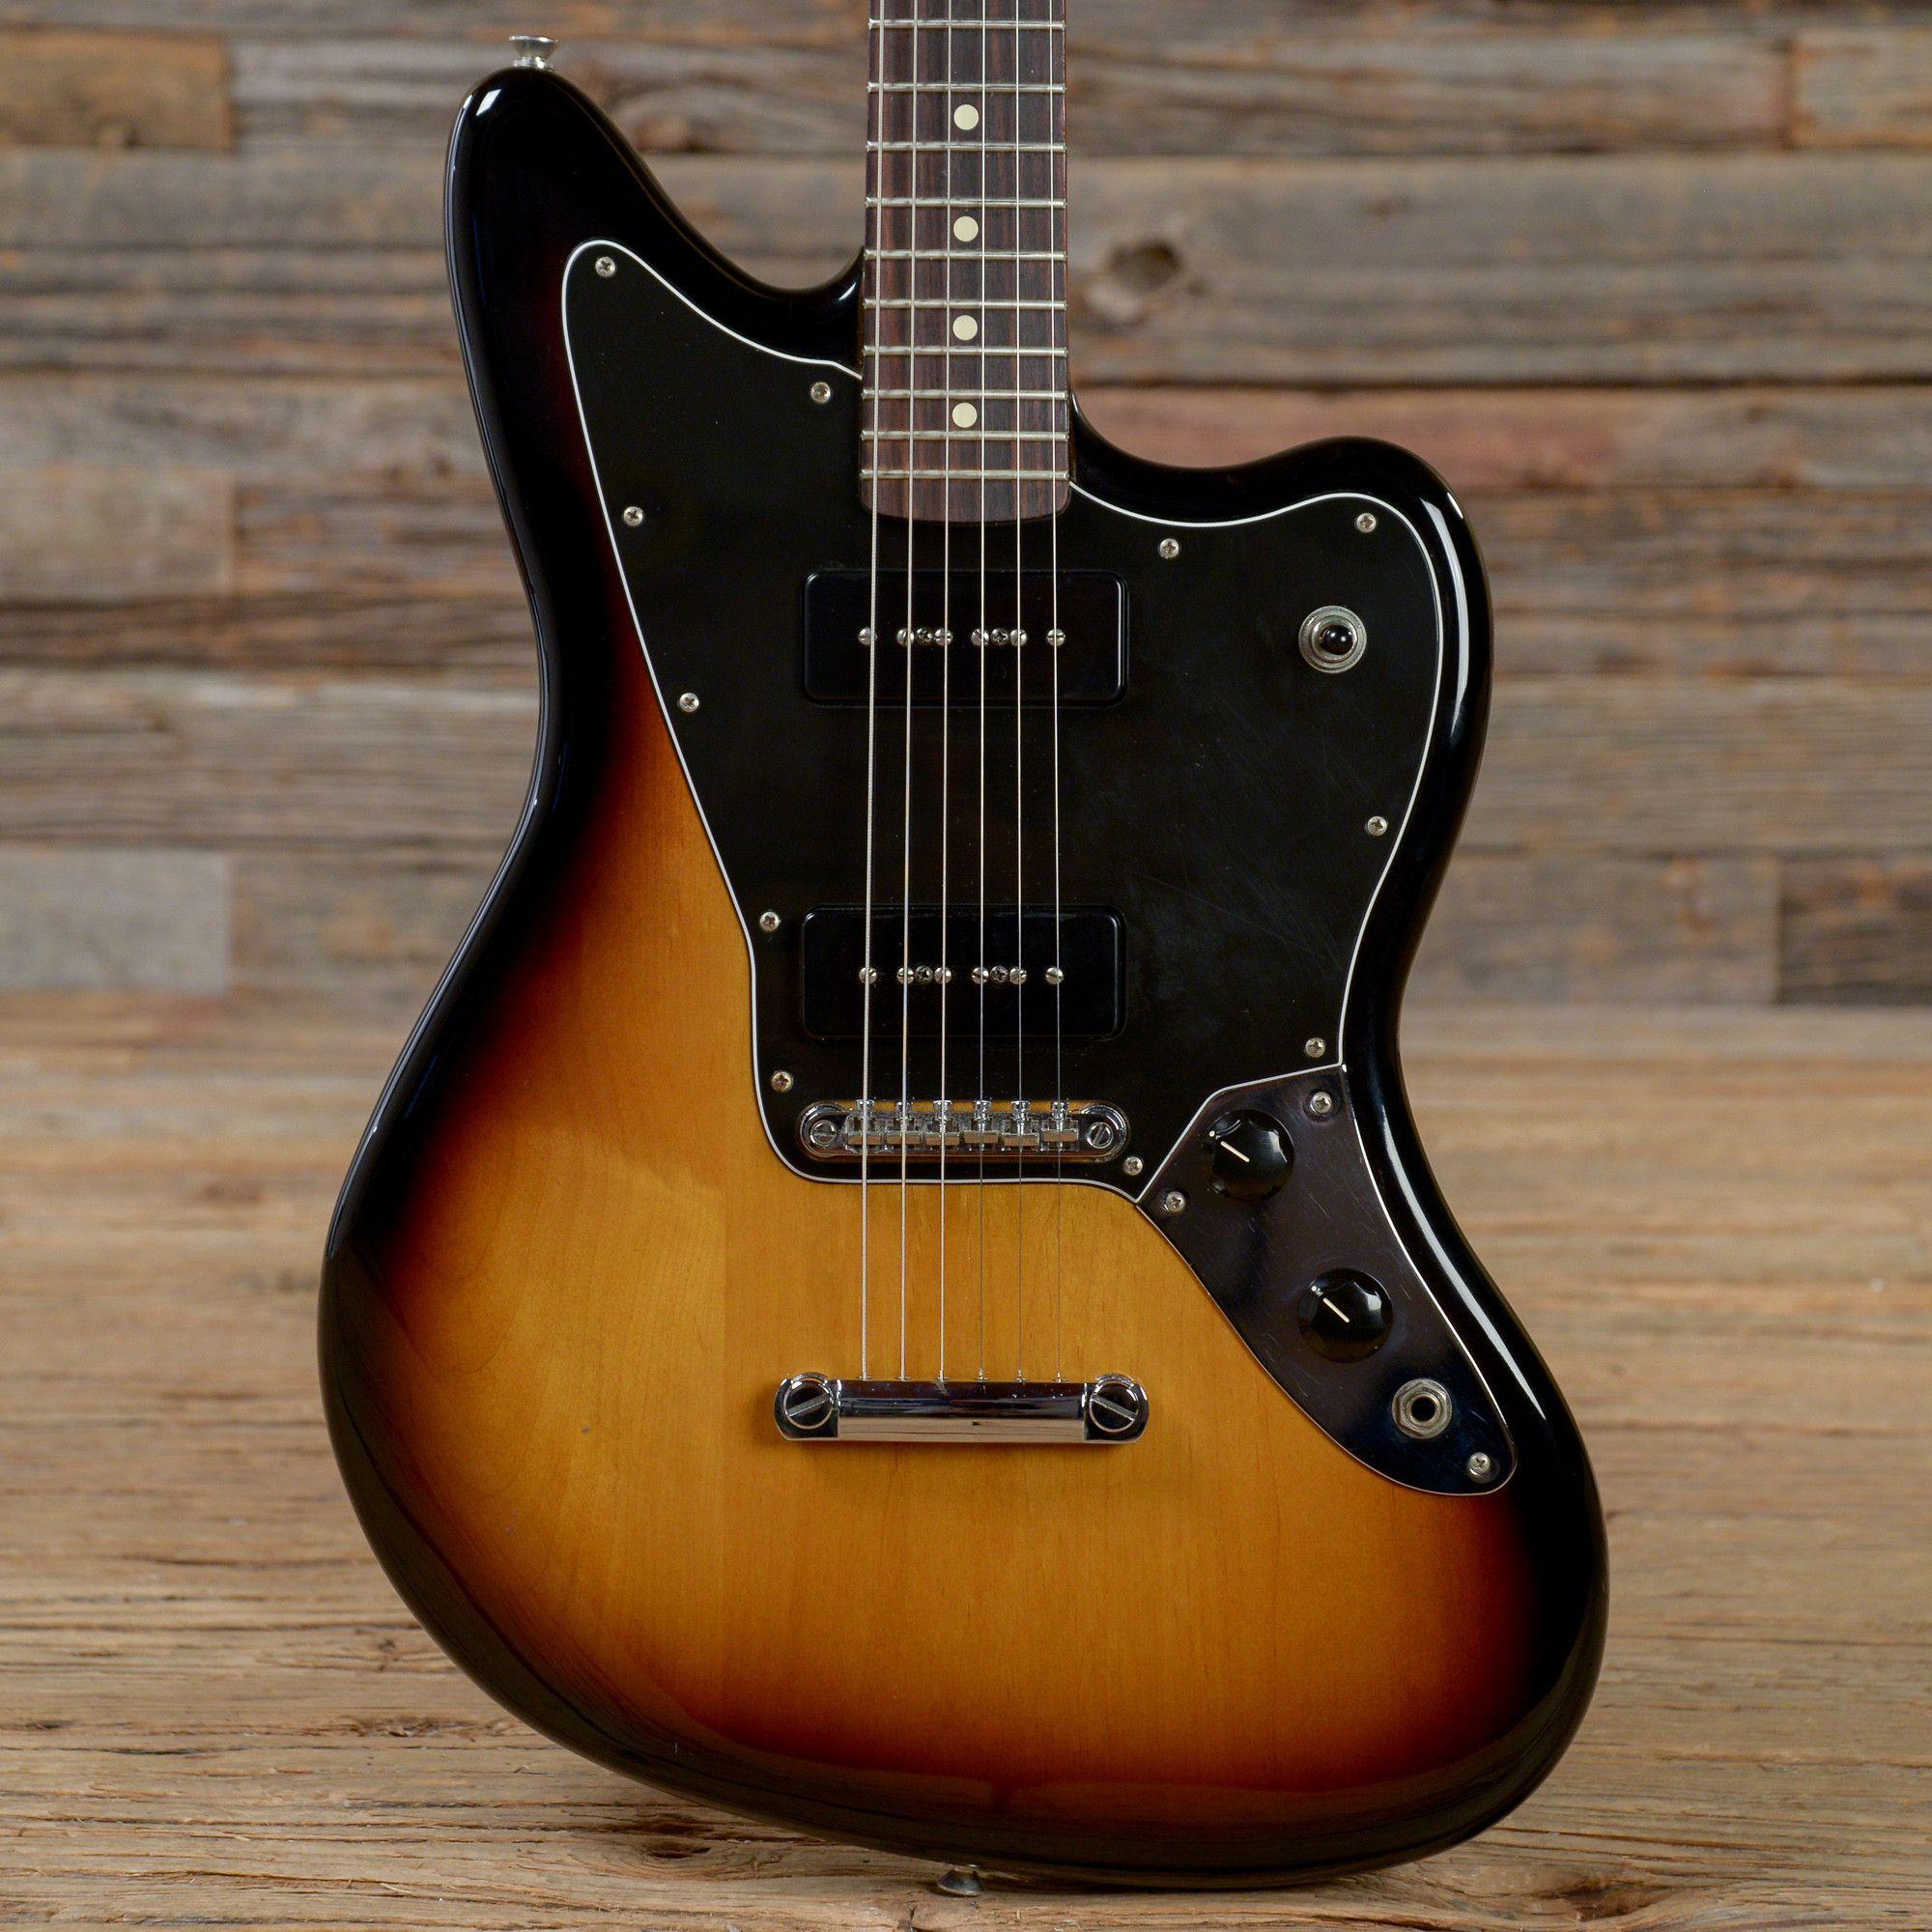 Fender Blacktop Jaguar 90 Sunburst 2011 S122